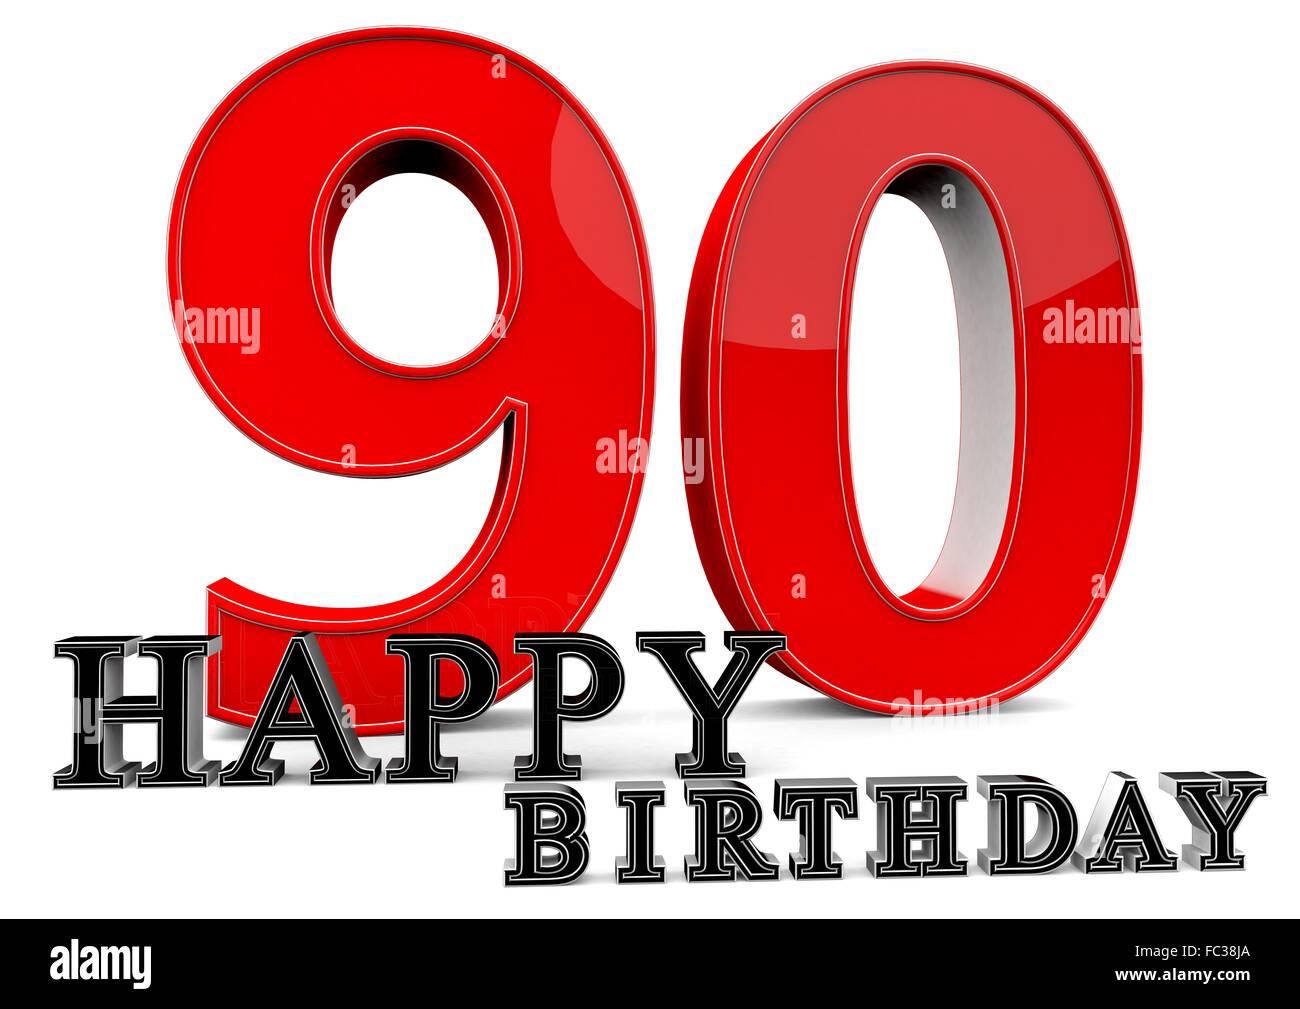 Happy birthday zum 90 geburtstag stock photo 93500354 alamy - Ideen zum 90 geburtstag ...